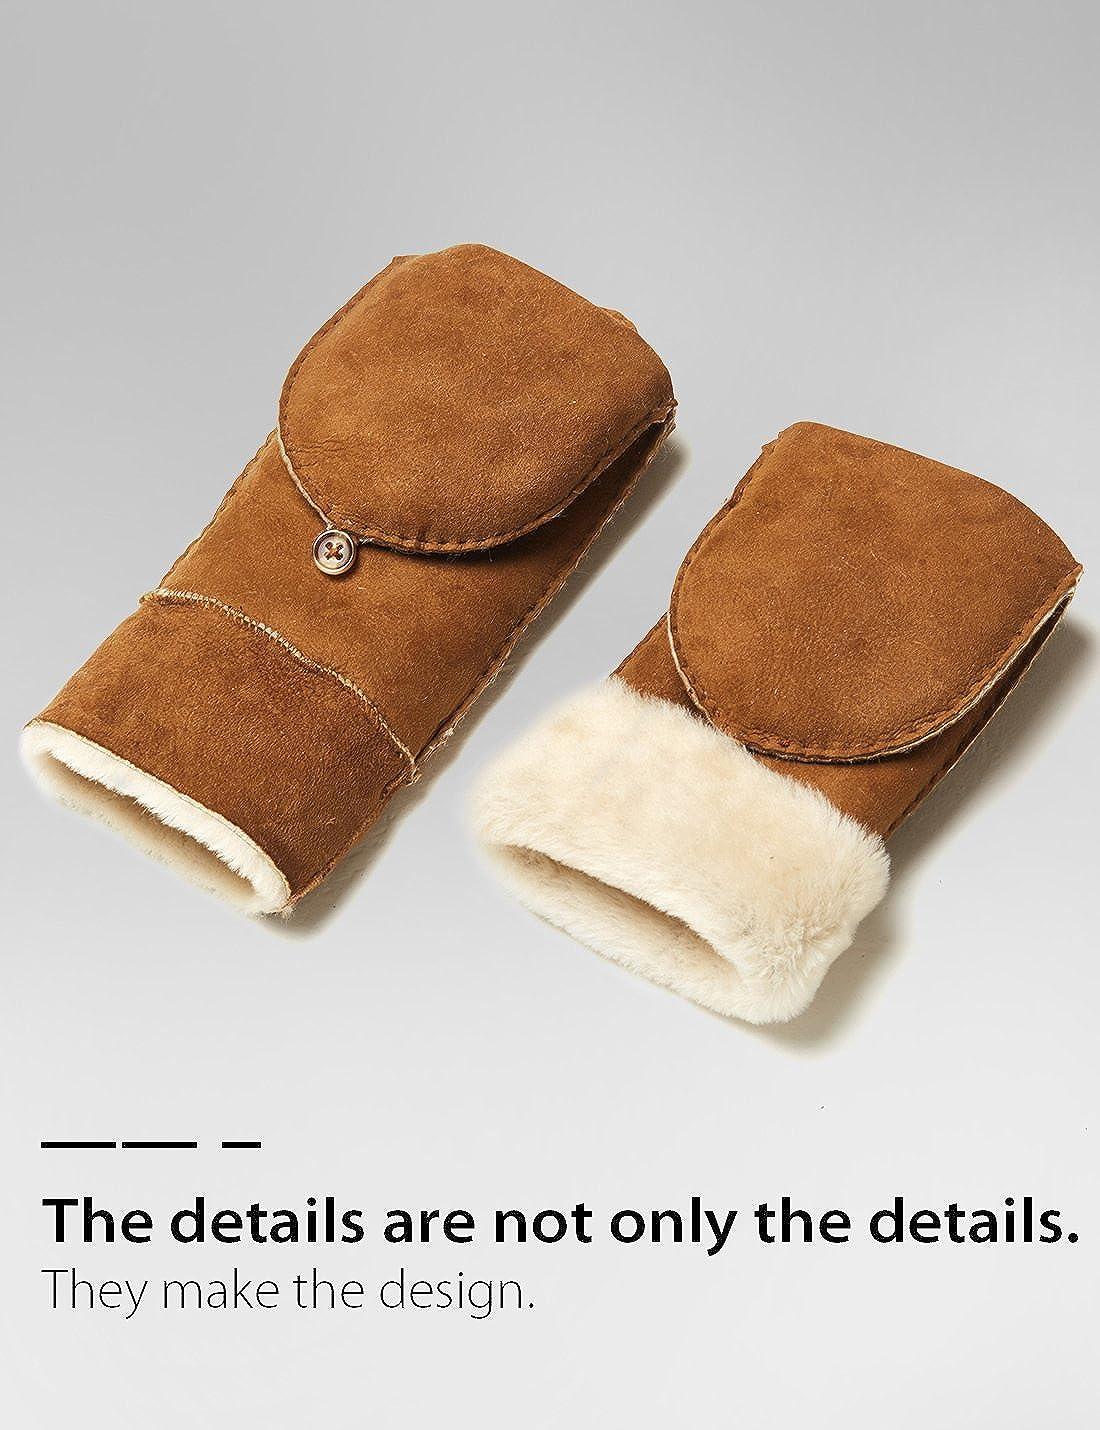 b79145757 Mittens YISEVEN Womens Merino Sheepskin Leather Gloves Flip Fingerless  Mitten Half Finger Sherpa Fur Cuff Thick Wool Lined and Heated ...